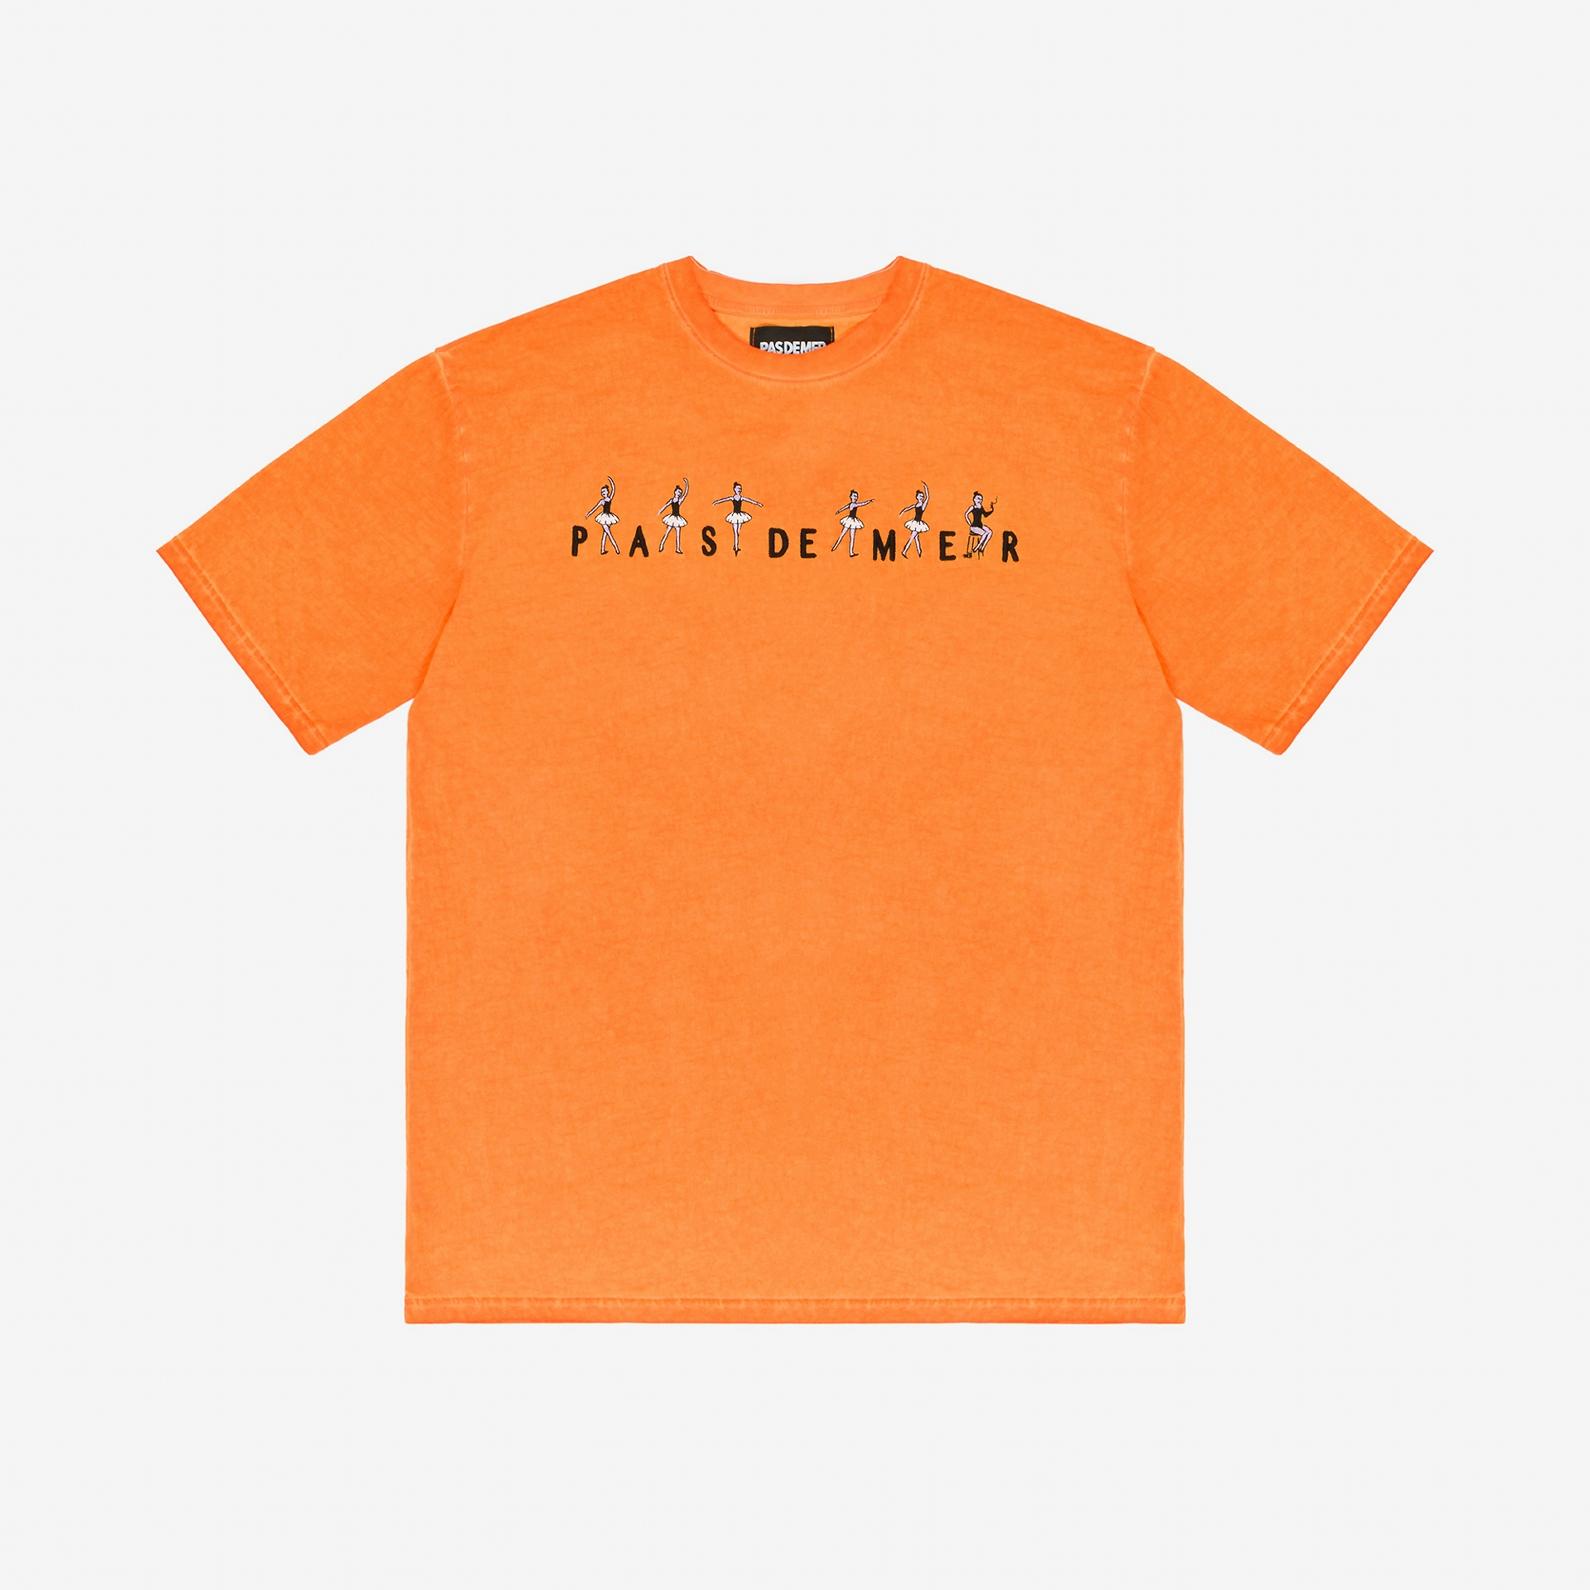 【PAS DE MER/パドゥメ】BALLET T-SHIRT Tシャツ / ORANGE